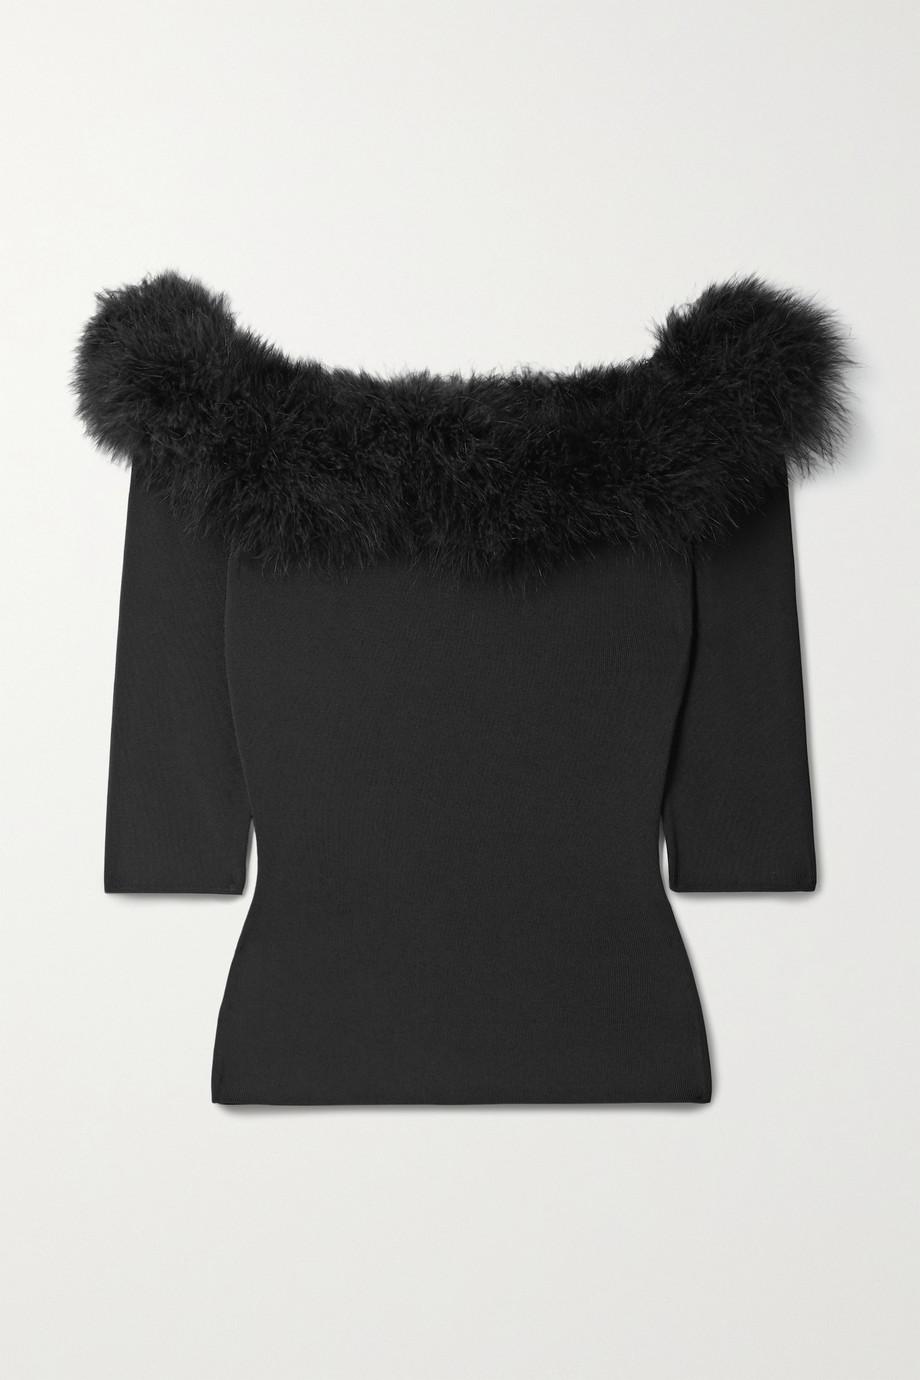 SAINT LAURENT Feather-trimmed stretch-knit top